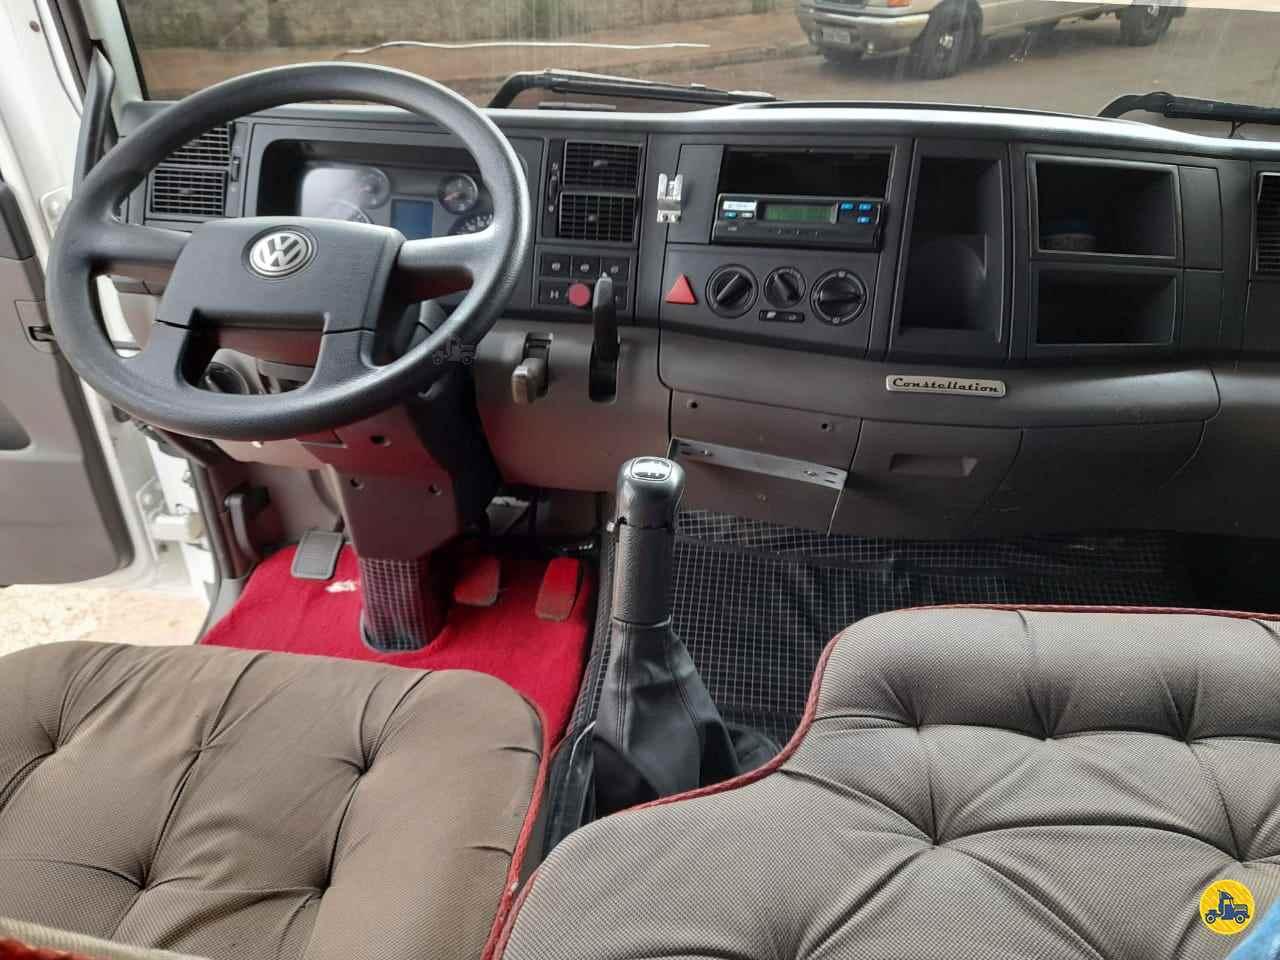 VOLKSWAGEN VW 25390 511000km 2012/2012 DKM Caminhões